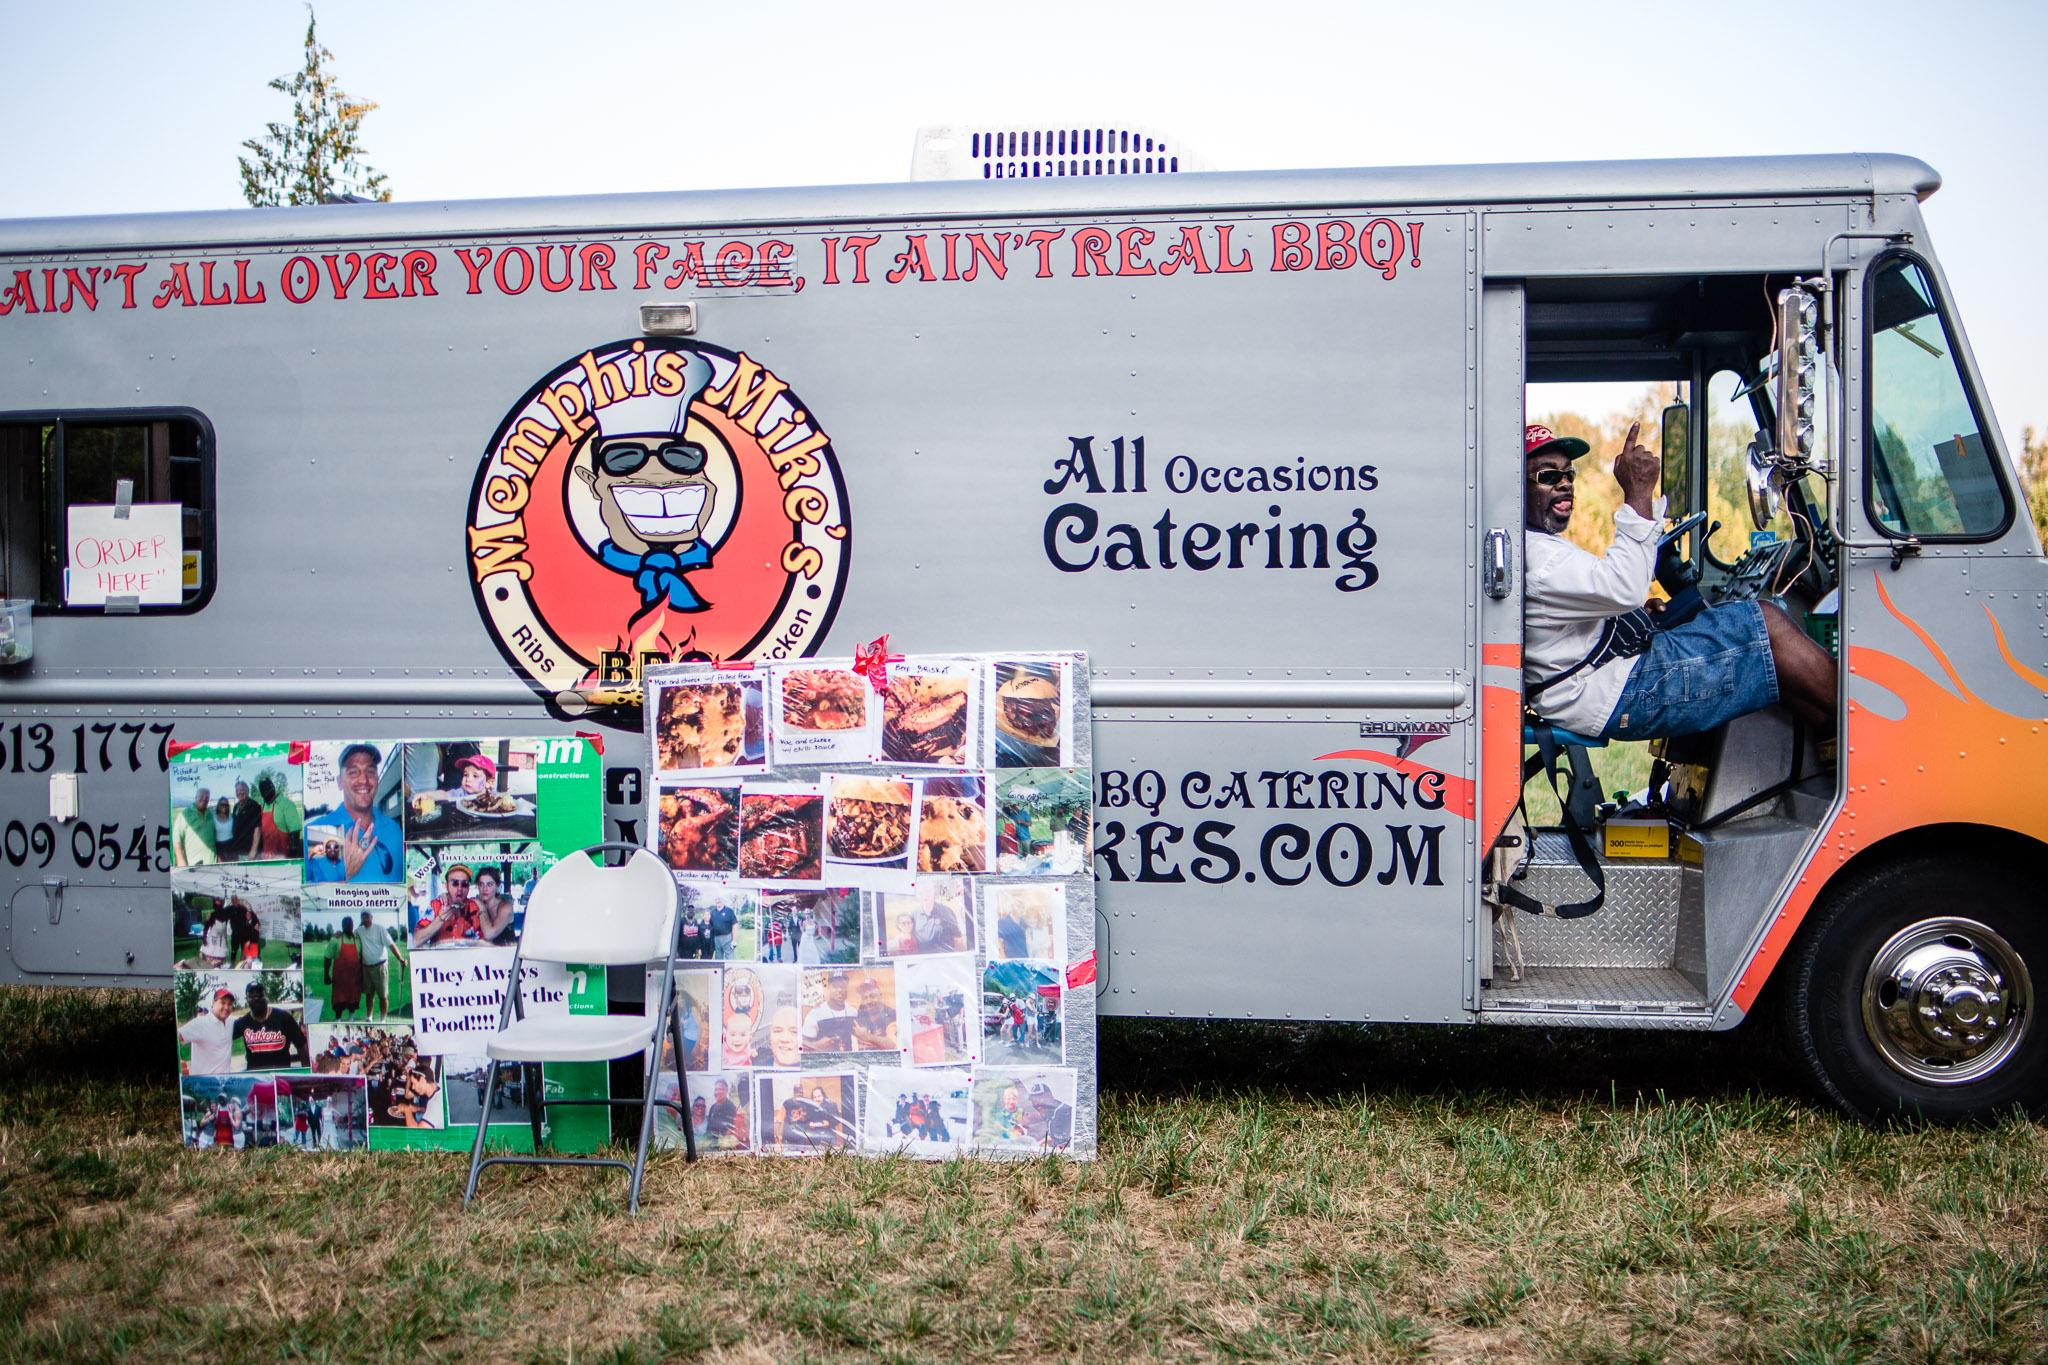 White-Owl-Barn-Langley-Wedding-Photographer-Rustic-Scottish-Country-Food-Truck-Documentary-Open-Bar-Wedding-1121.jpg